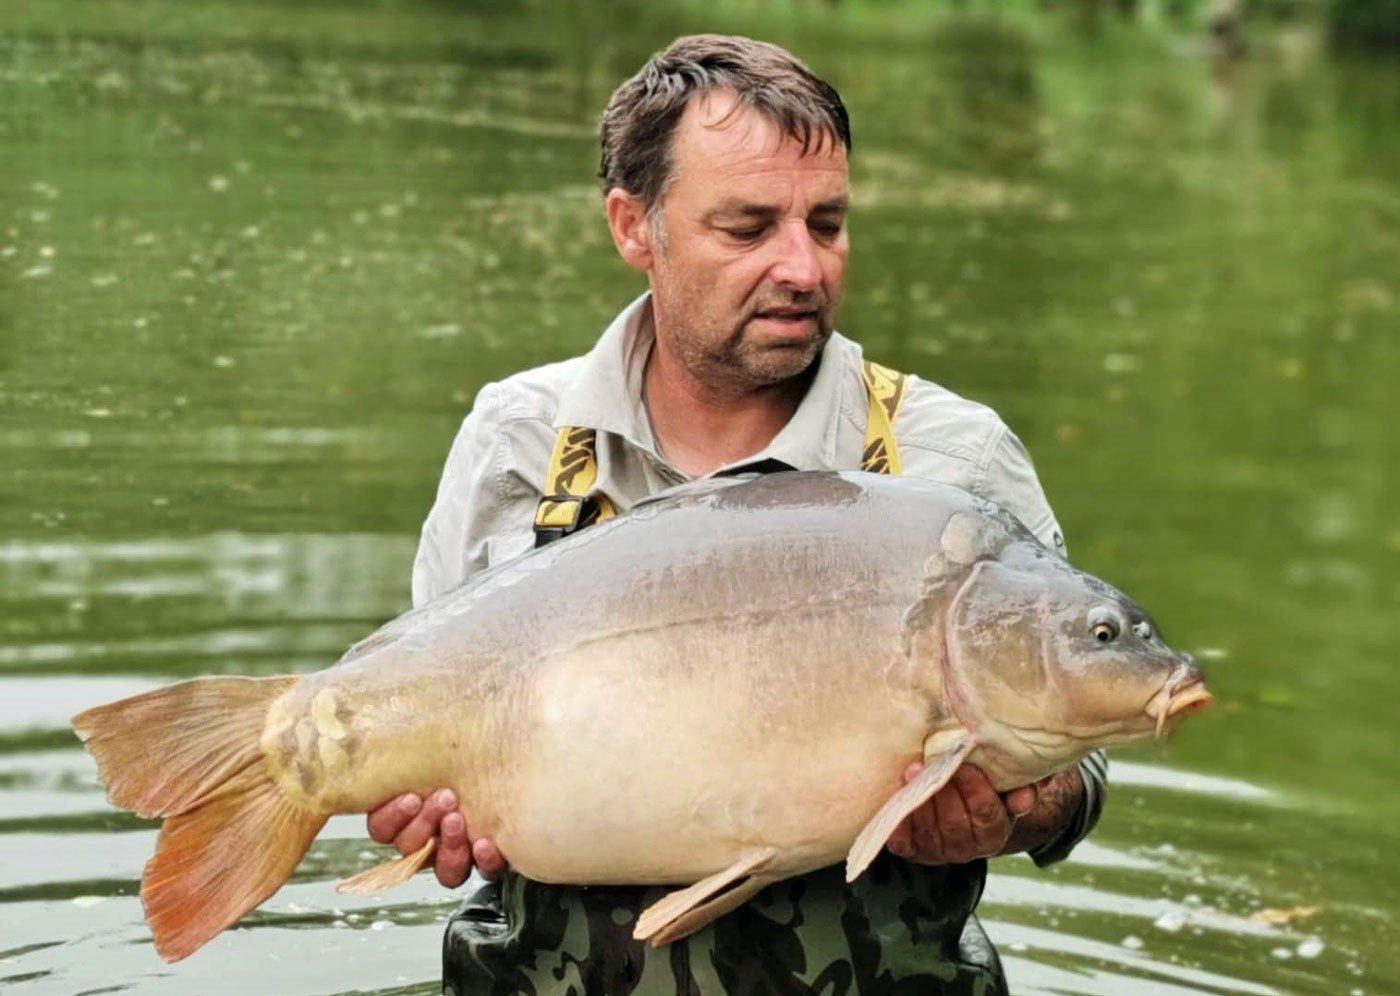 angler with 35lb mirror carp